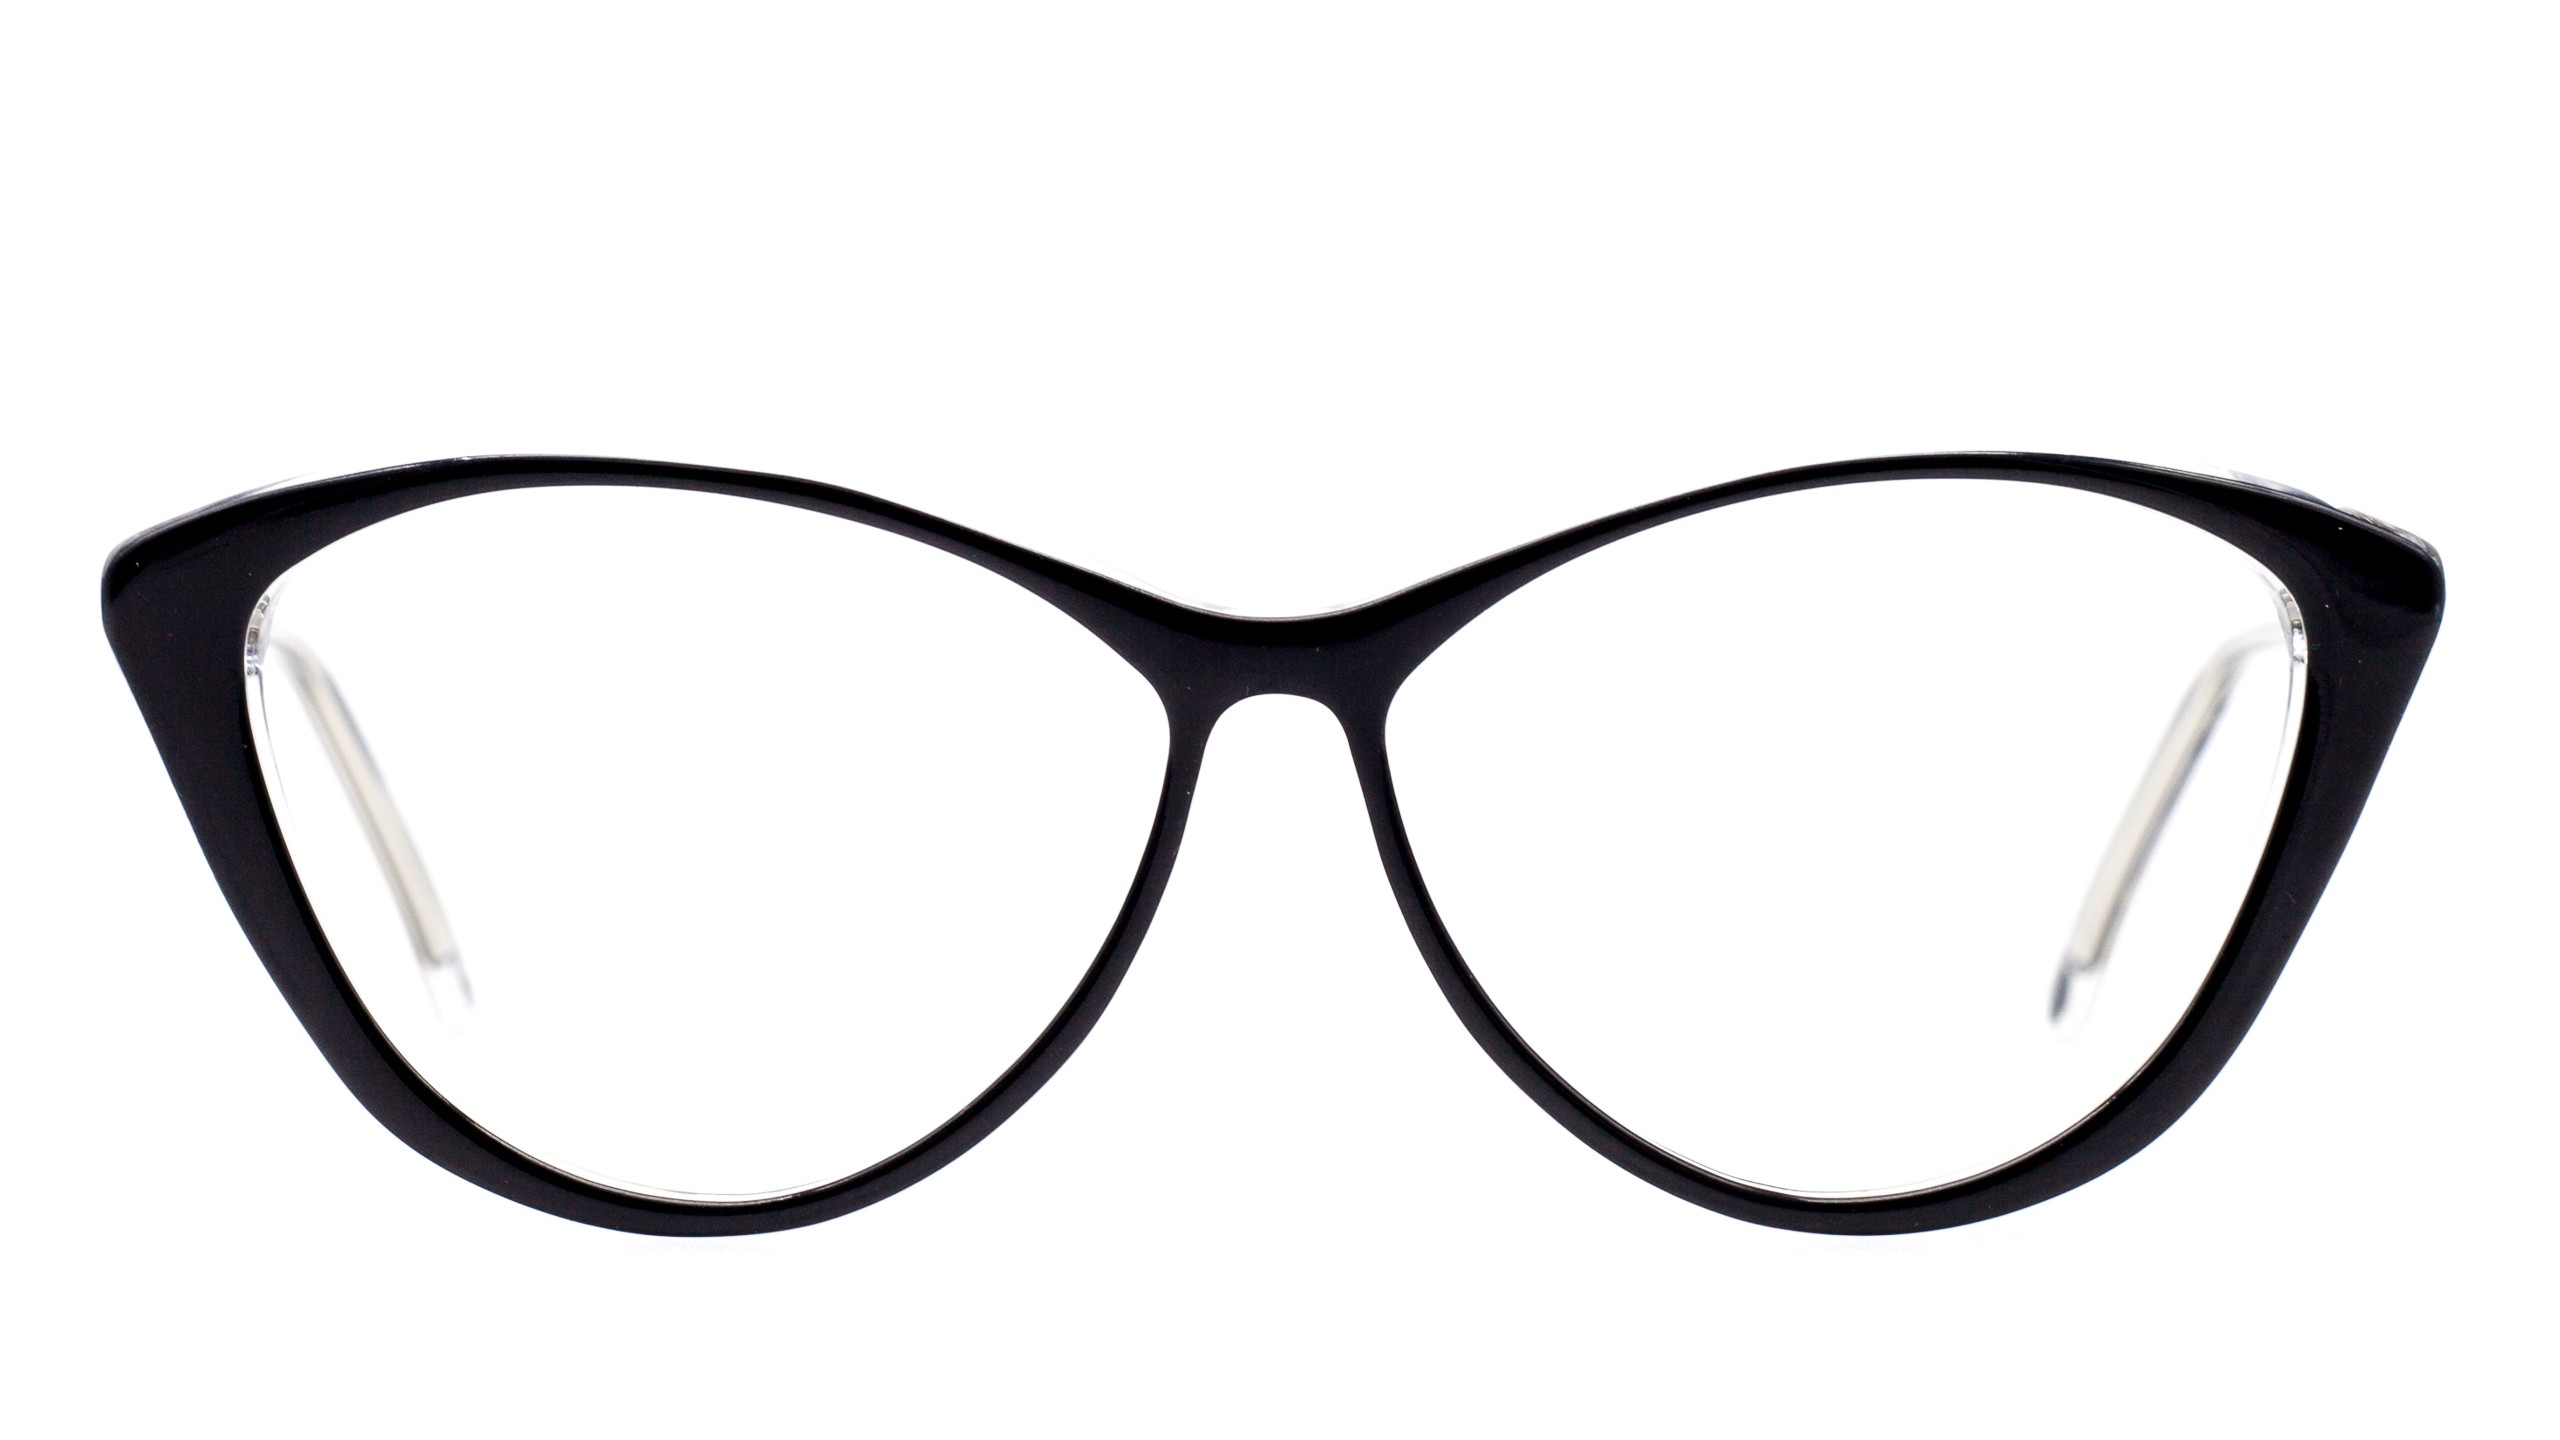 eyeglasses-Nathan-Kaltermann-made-in-Italy-Audrey-C01-Vista1